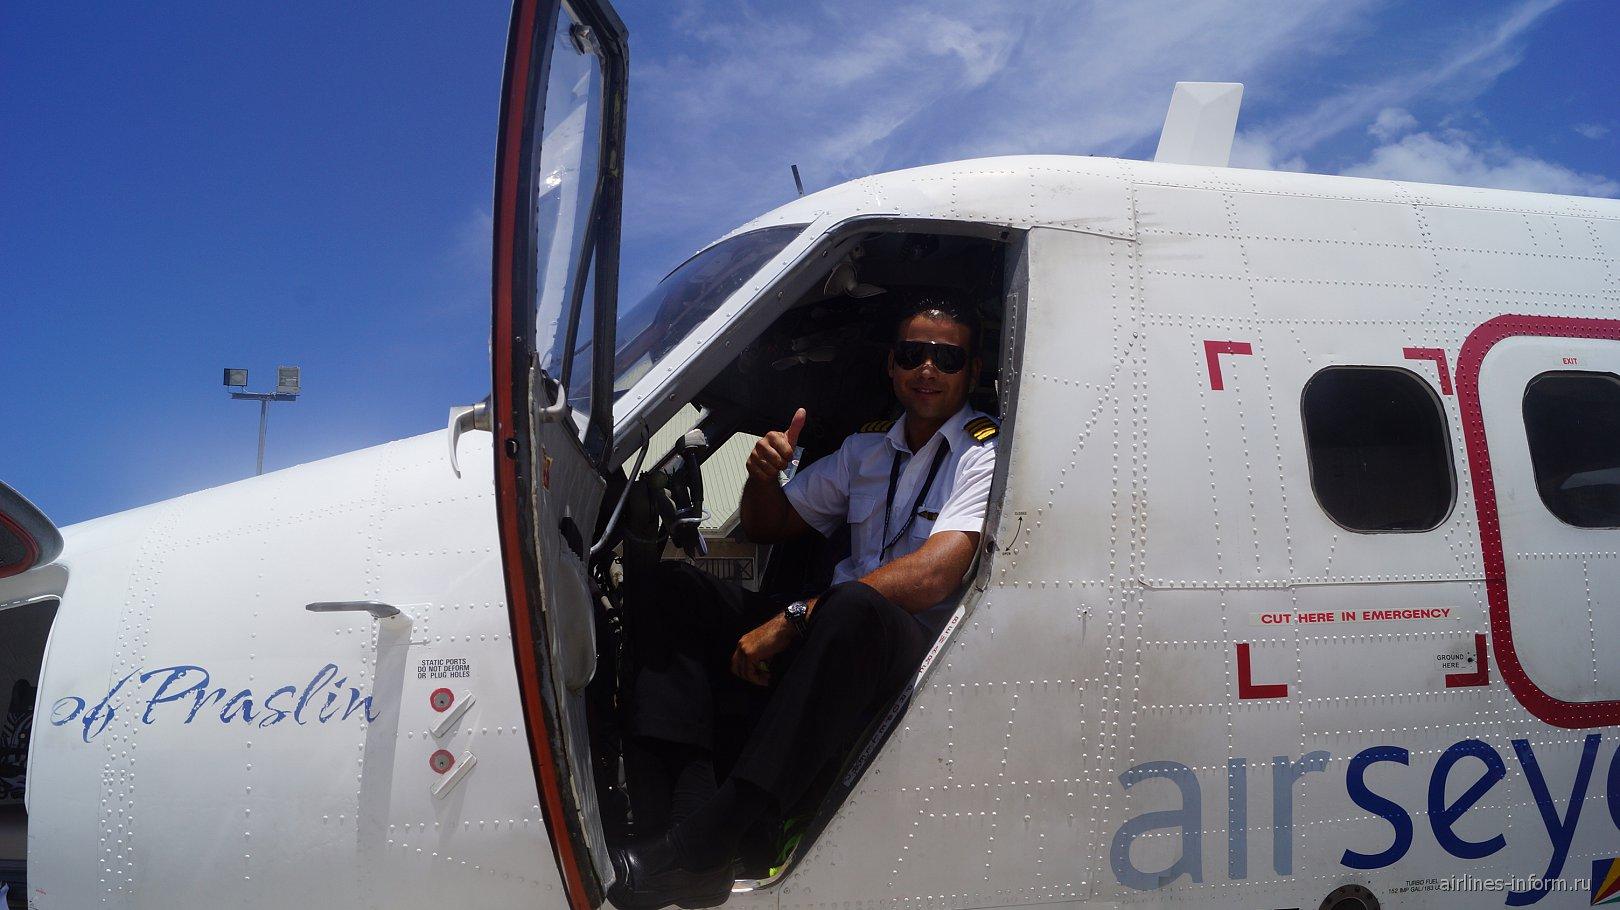 Пилот самолета DHC-6 Twin Otter авиакомпании Air Seychelles